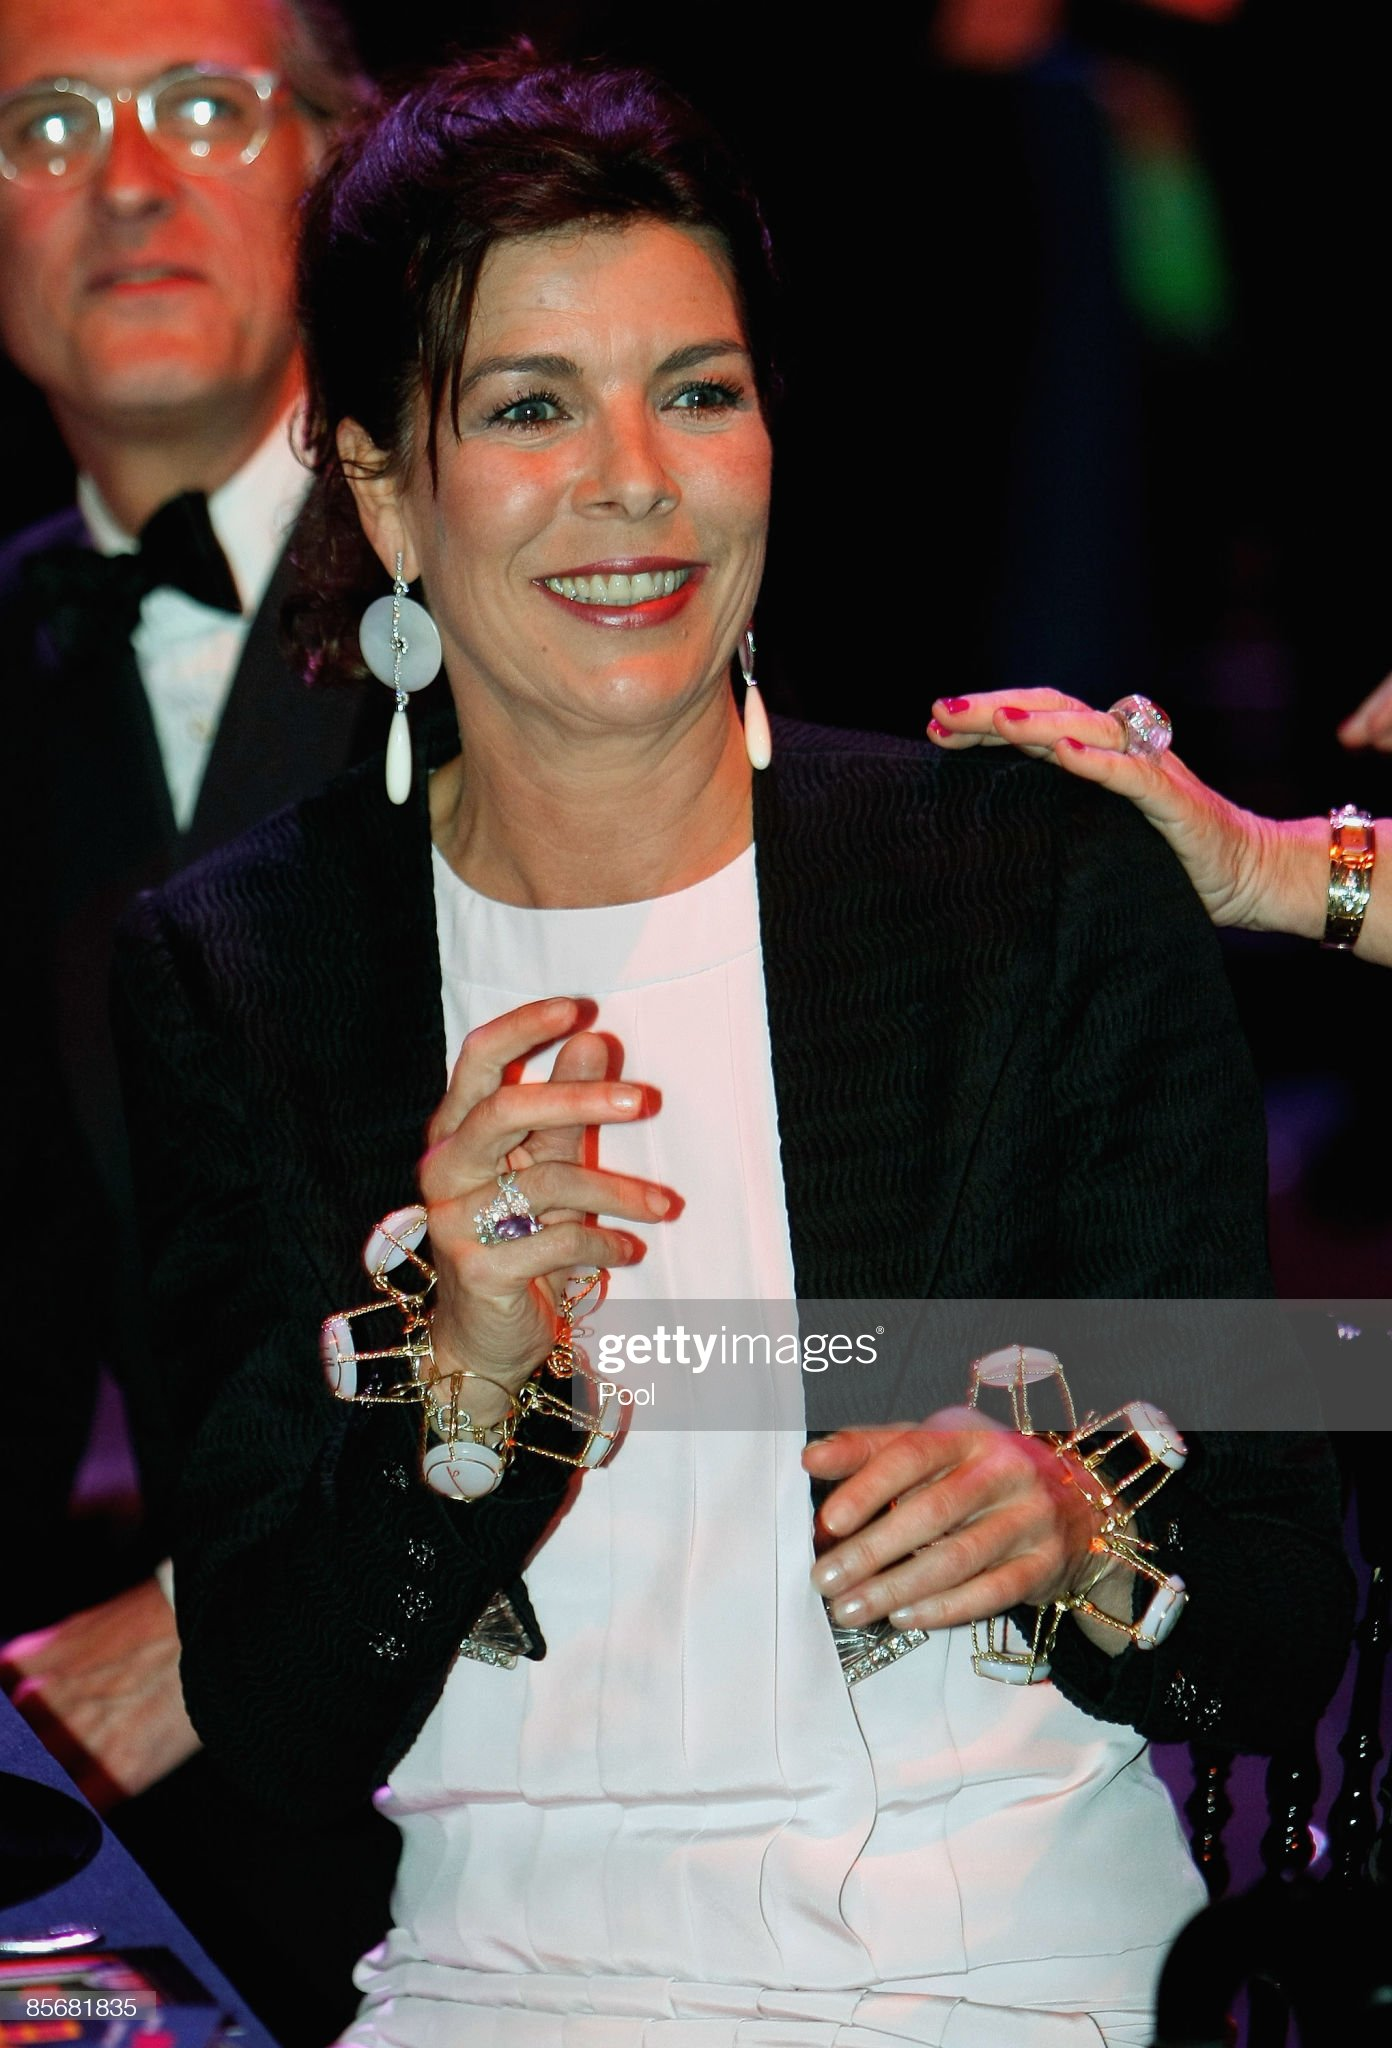 Вечерние наряды Принцессы Каролины. 2009 Monte Carlo Rose Ball : News Photo